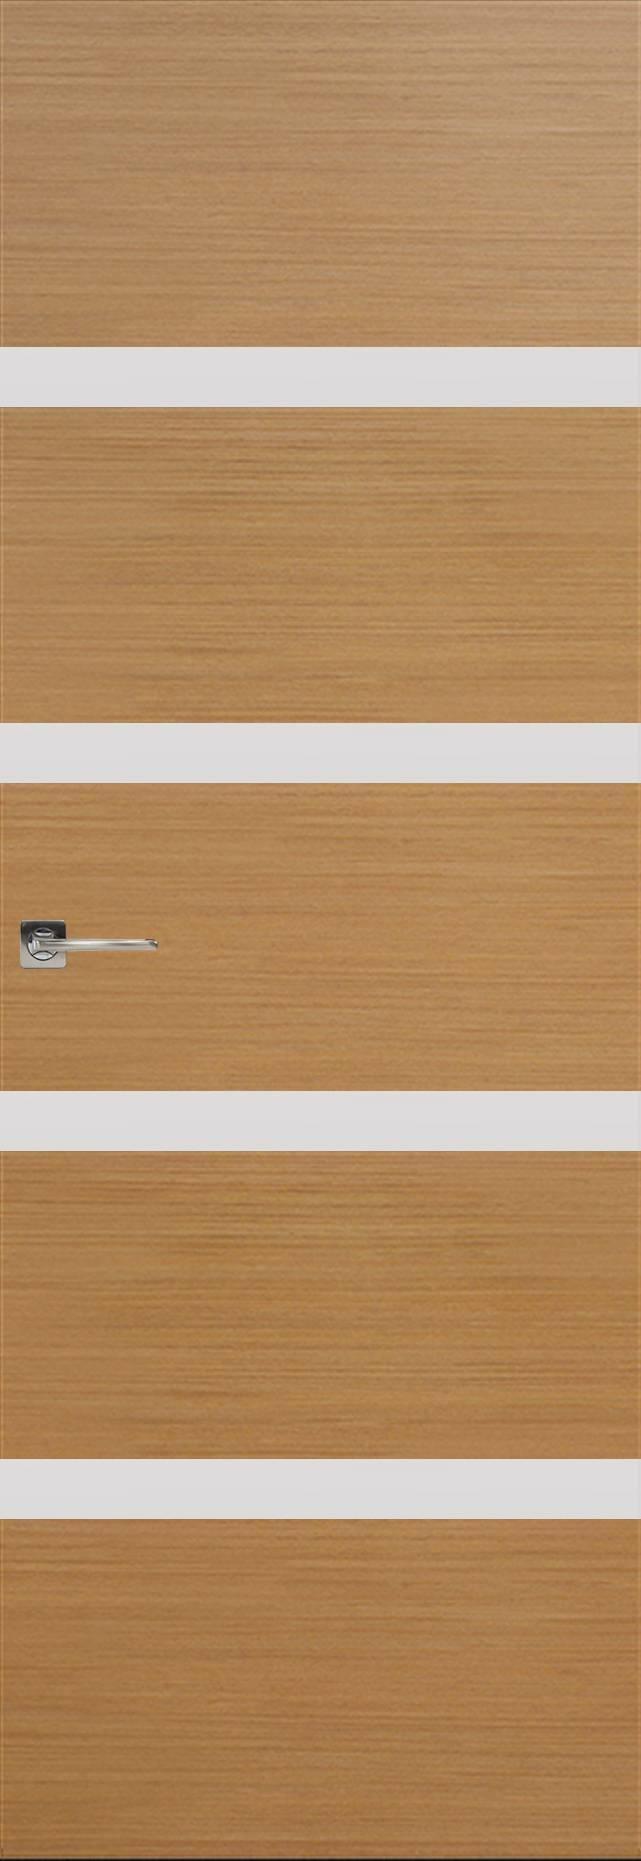 Tivoli Д-4 Невидимка цвет - Миланский орех Без стекла (ДГ)